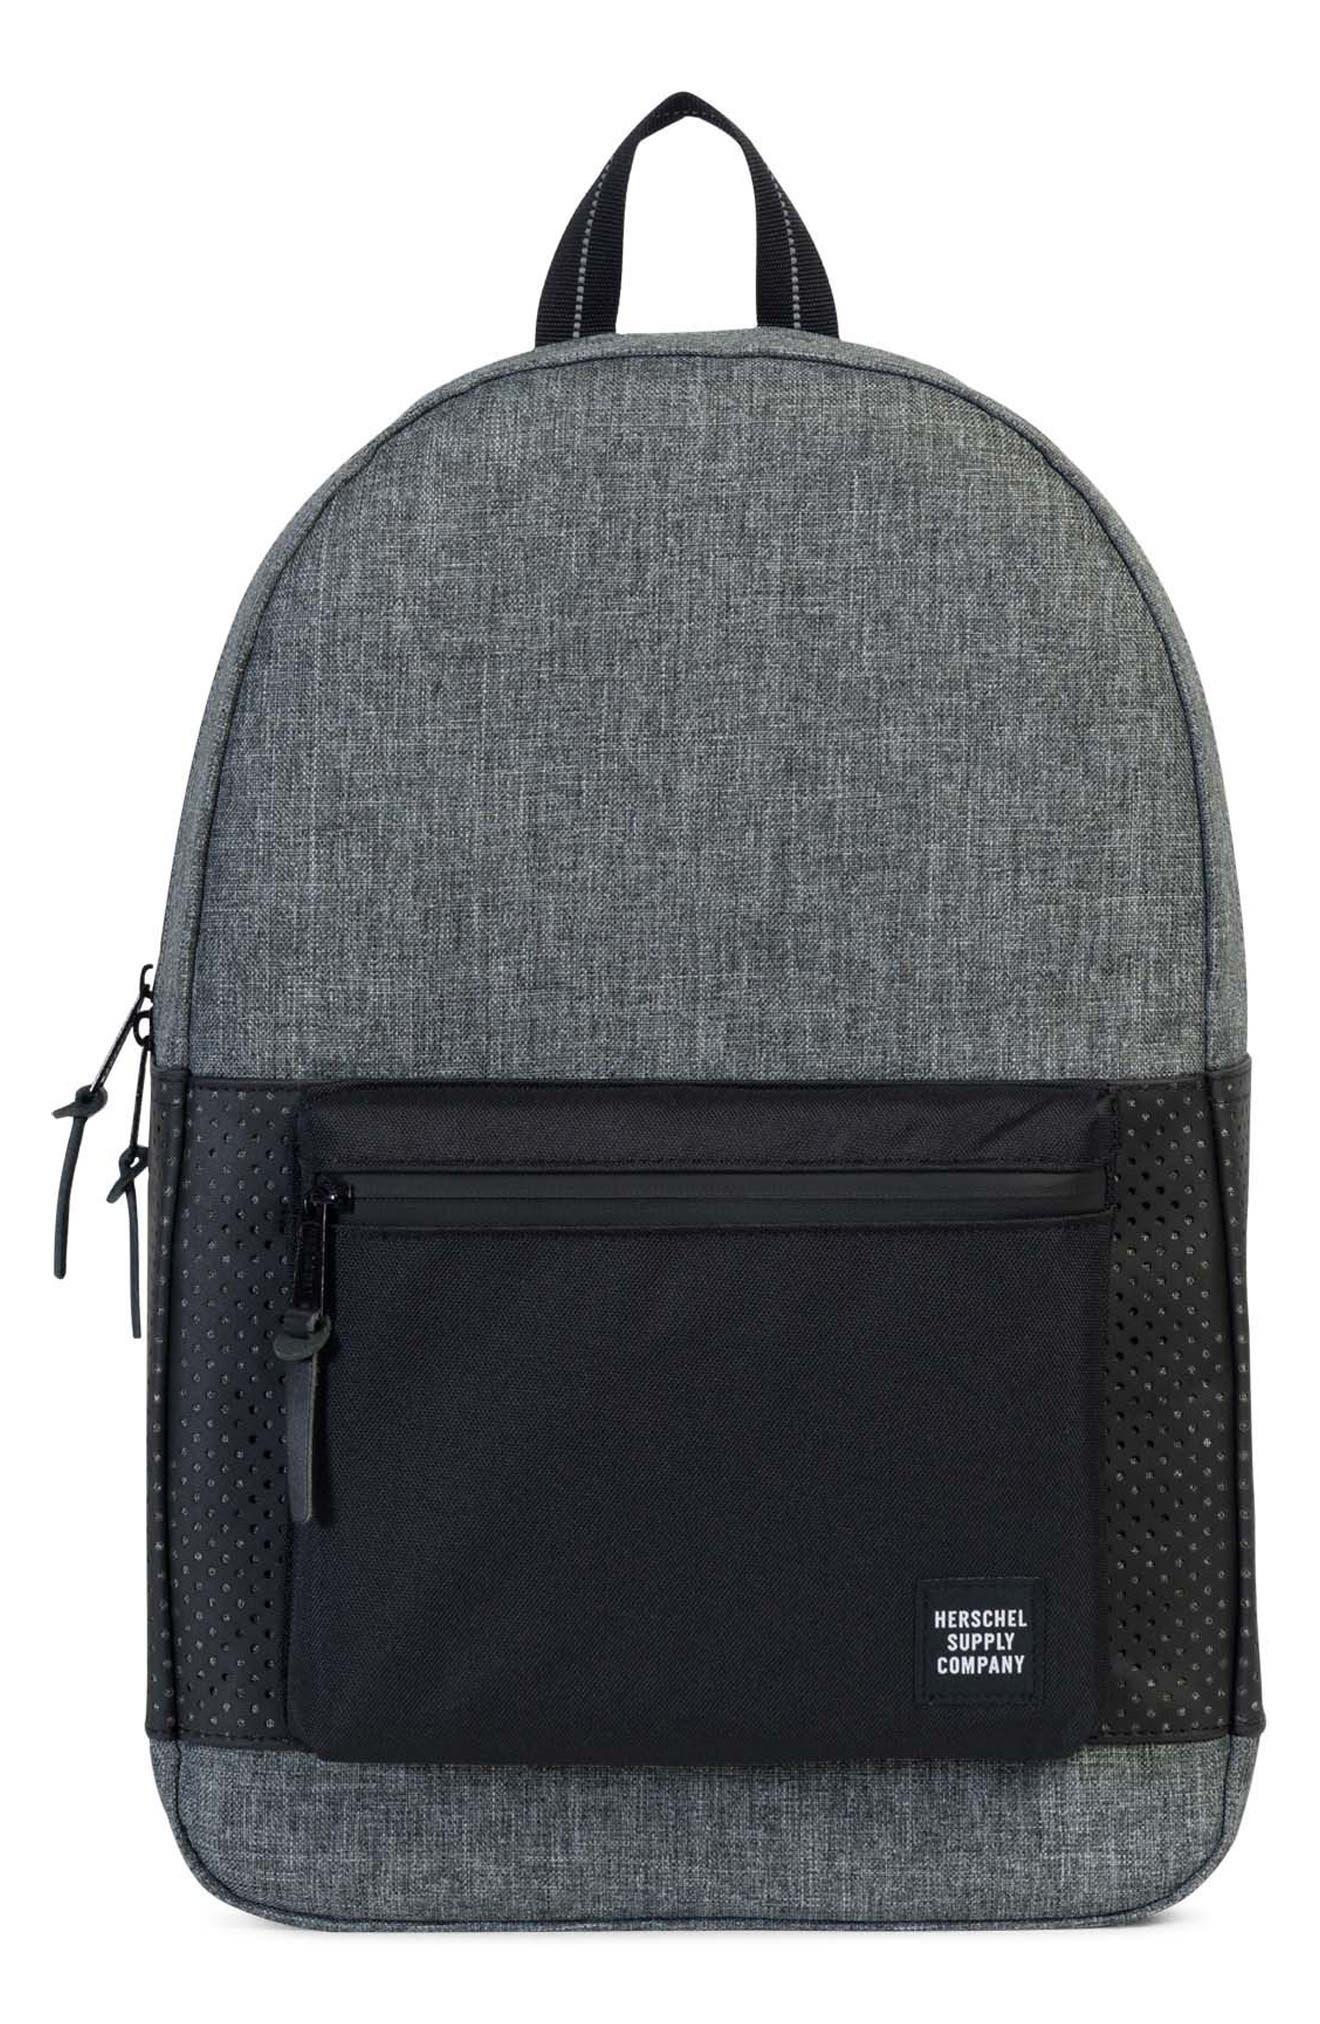 Settlement Aspect Backpack,                         Main,                         color, 032